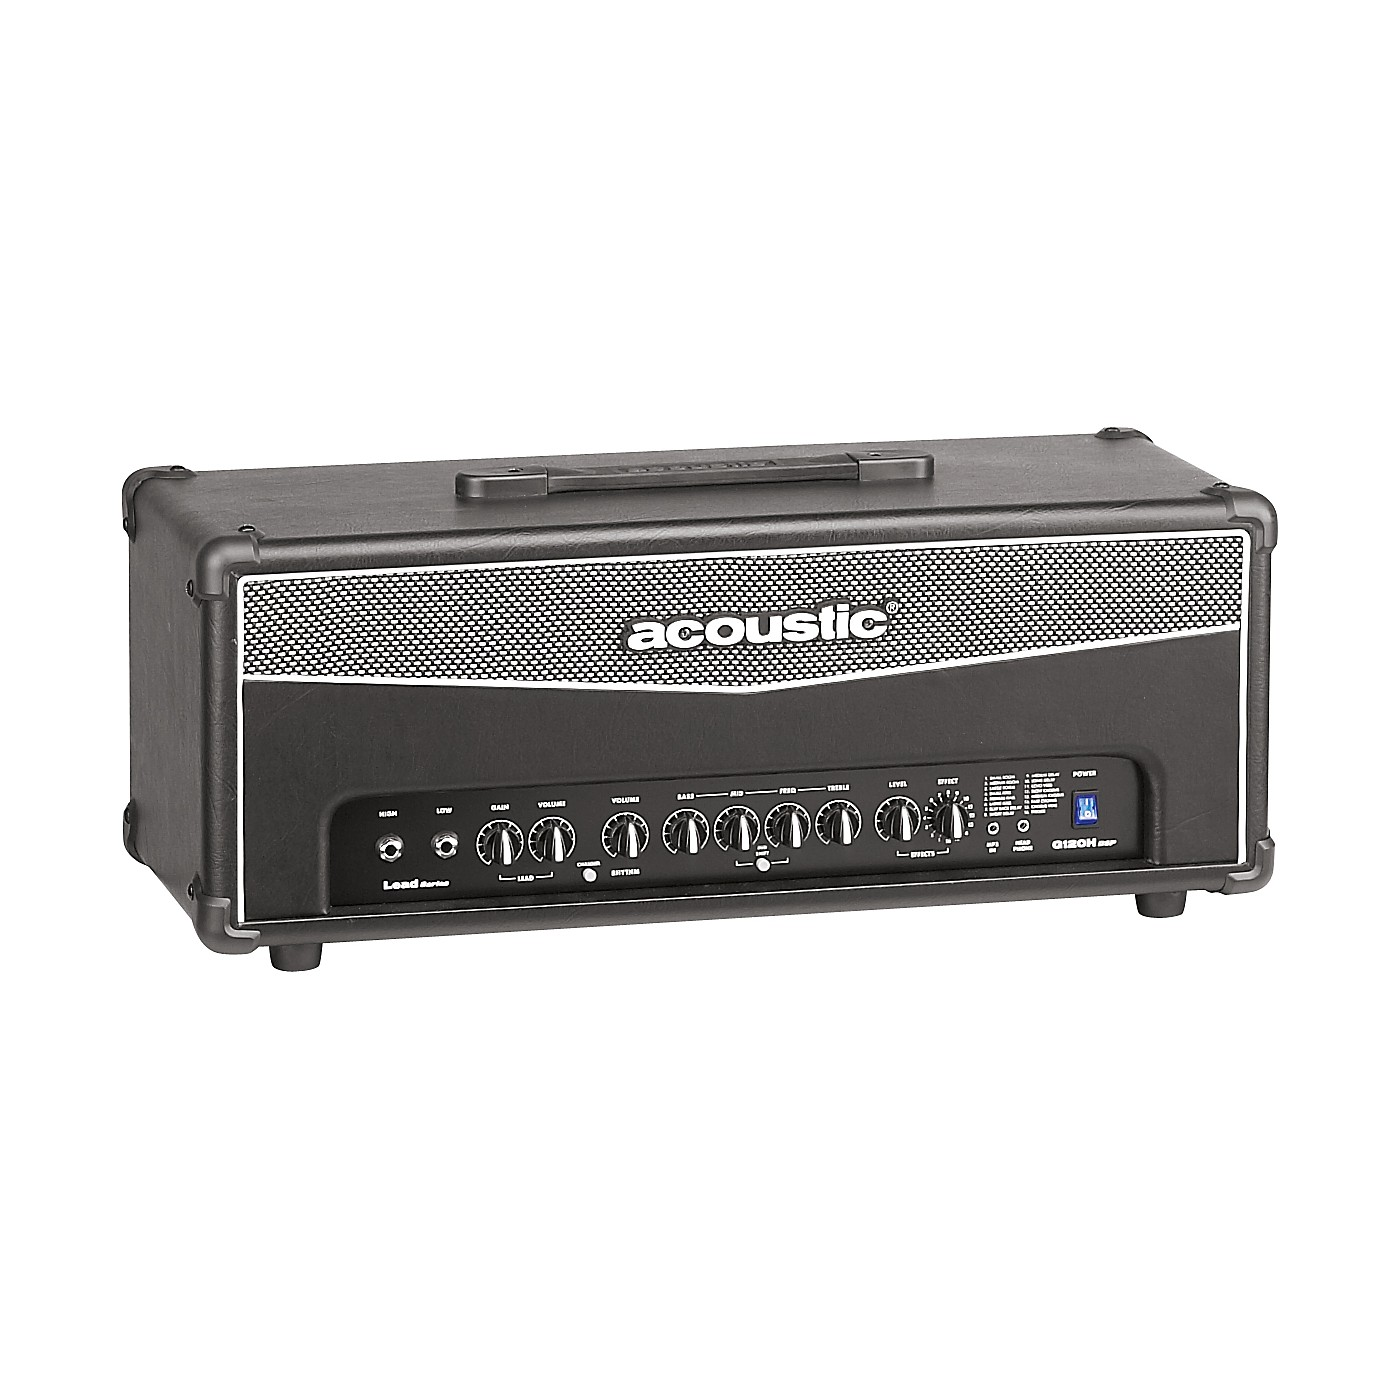 Acoustic Lead Guitar Series G120H DSP 120W Guitar Amp Head thumbnail